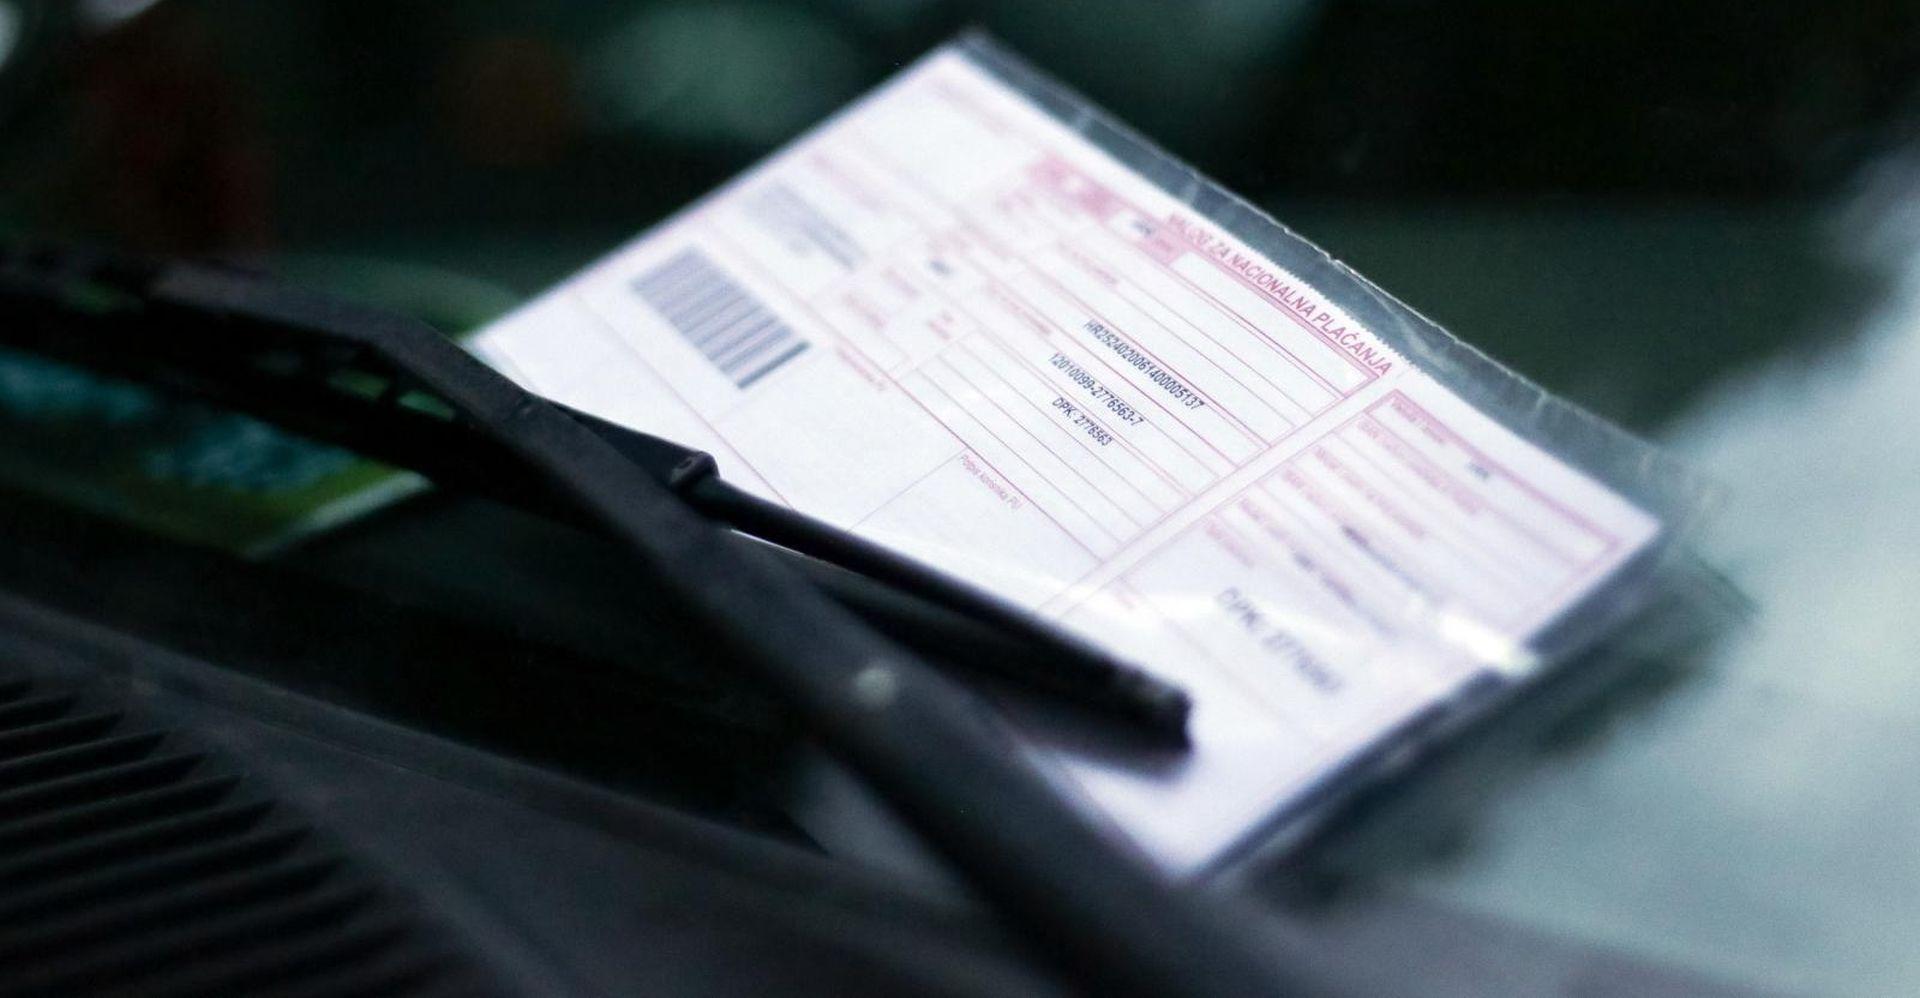 PRIPAZITE! U Zagrebu se pojavile lažne kazne za parkiranje